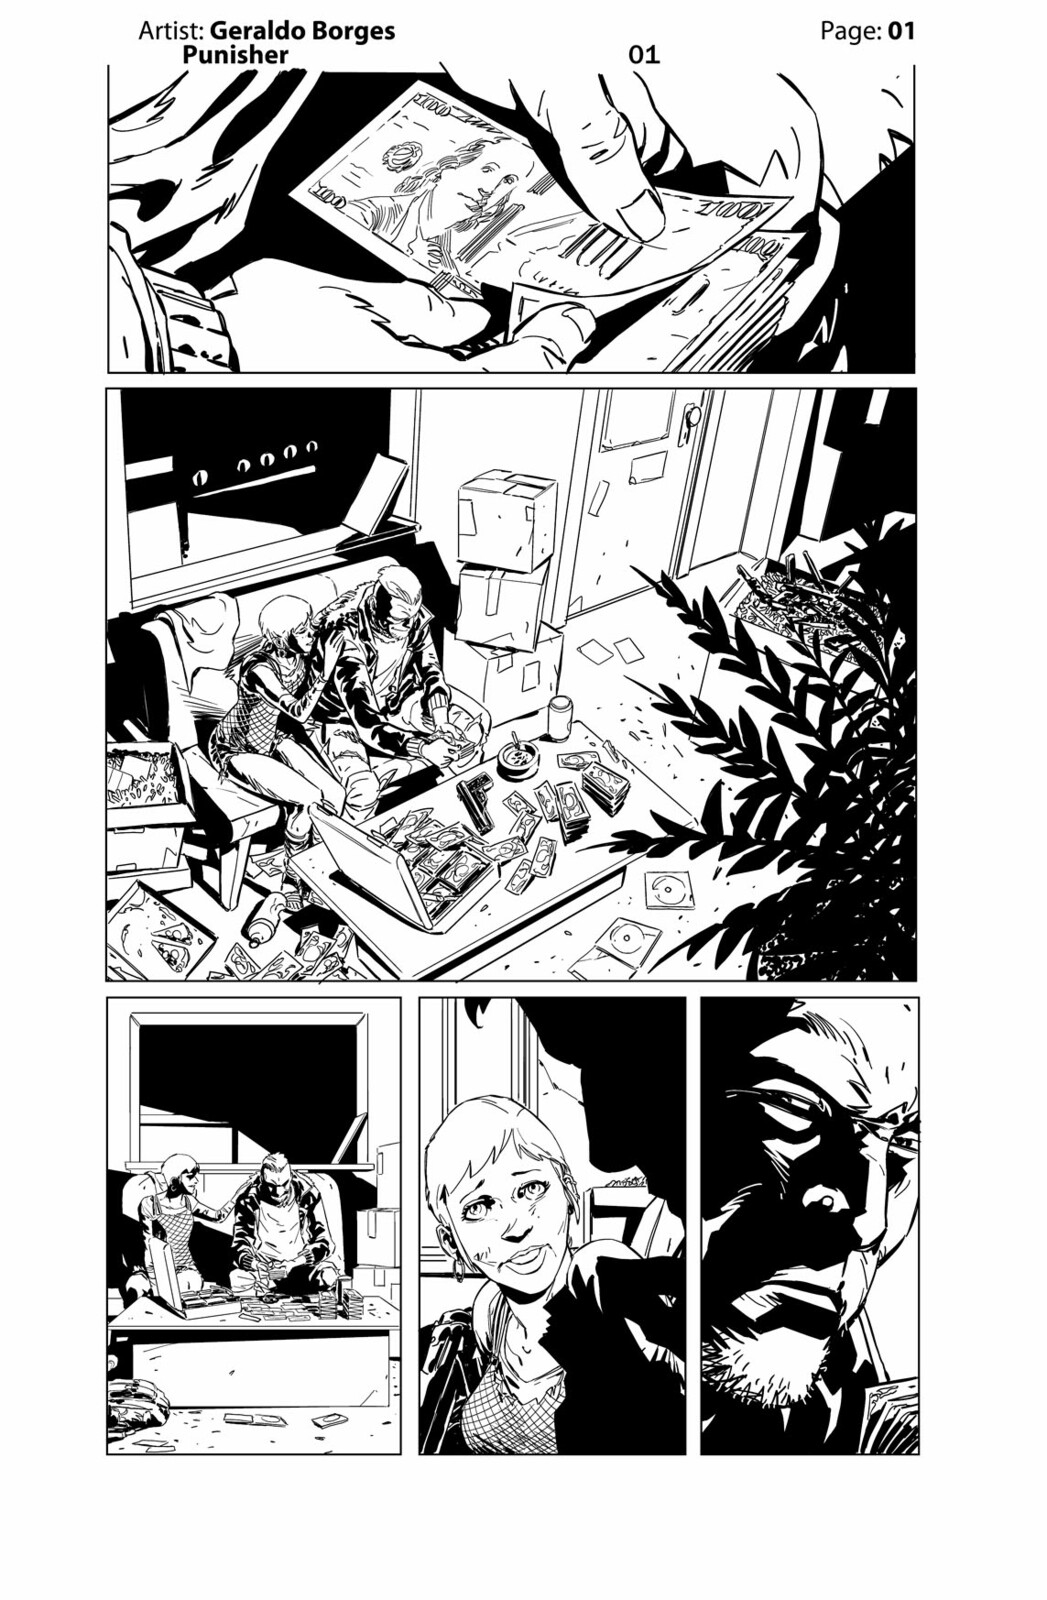 Geraldo Borges - Punisher Page 01